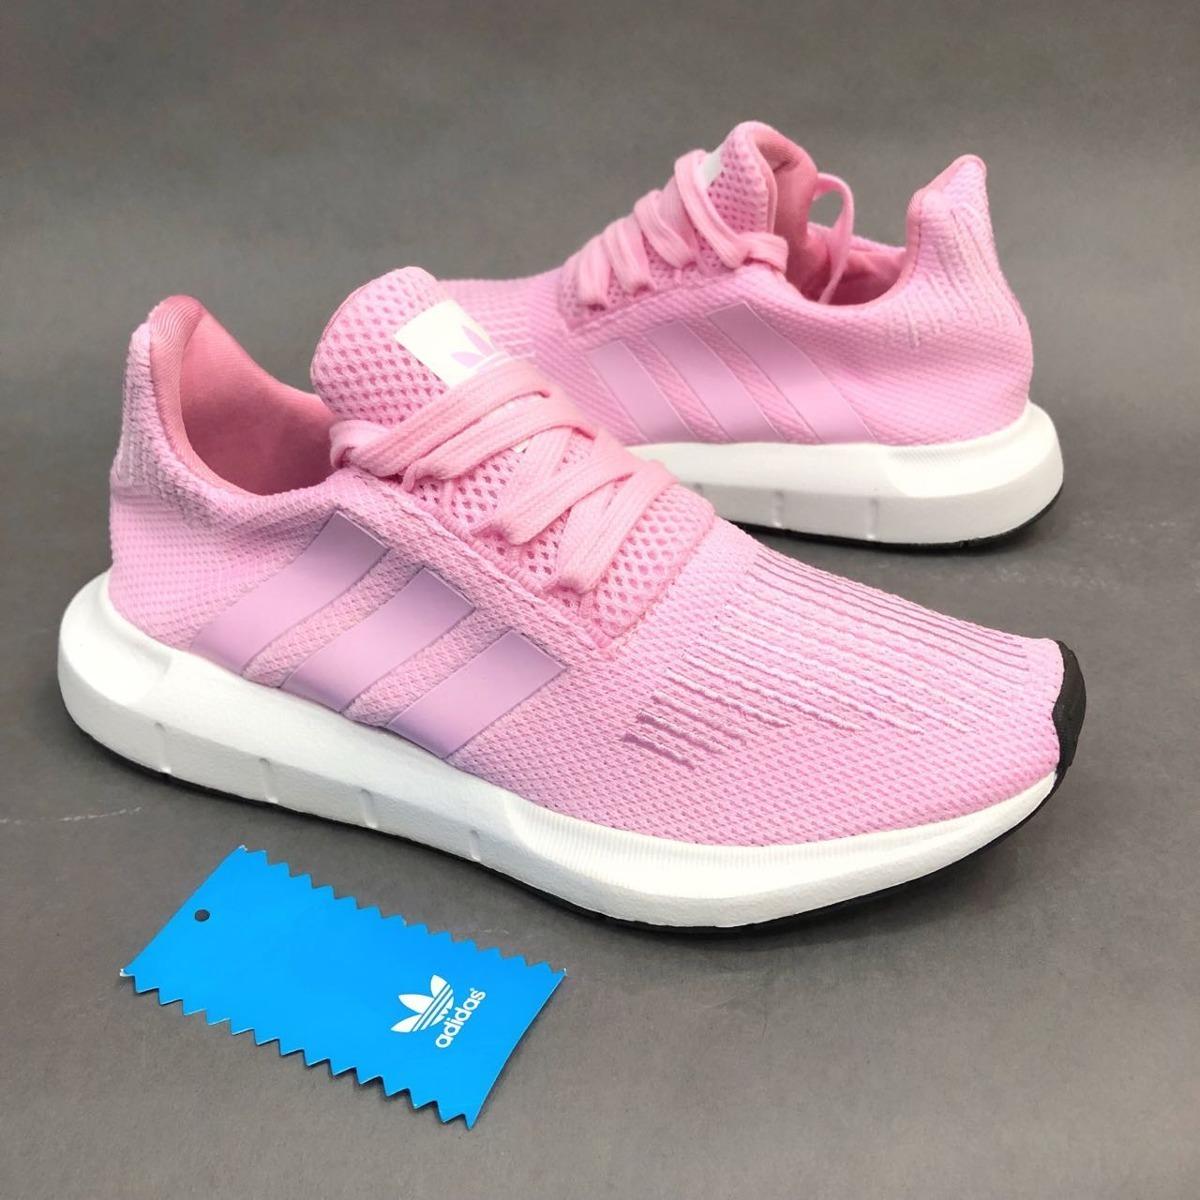 Botas Adidas Para Mujer 2018 | tenis adidas eqt zapatos ...